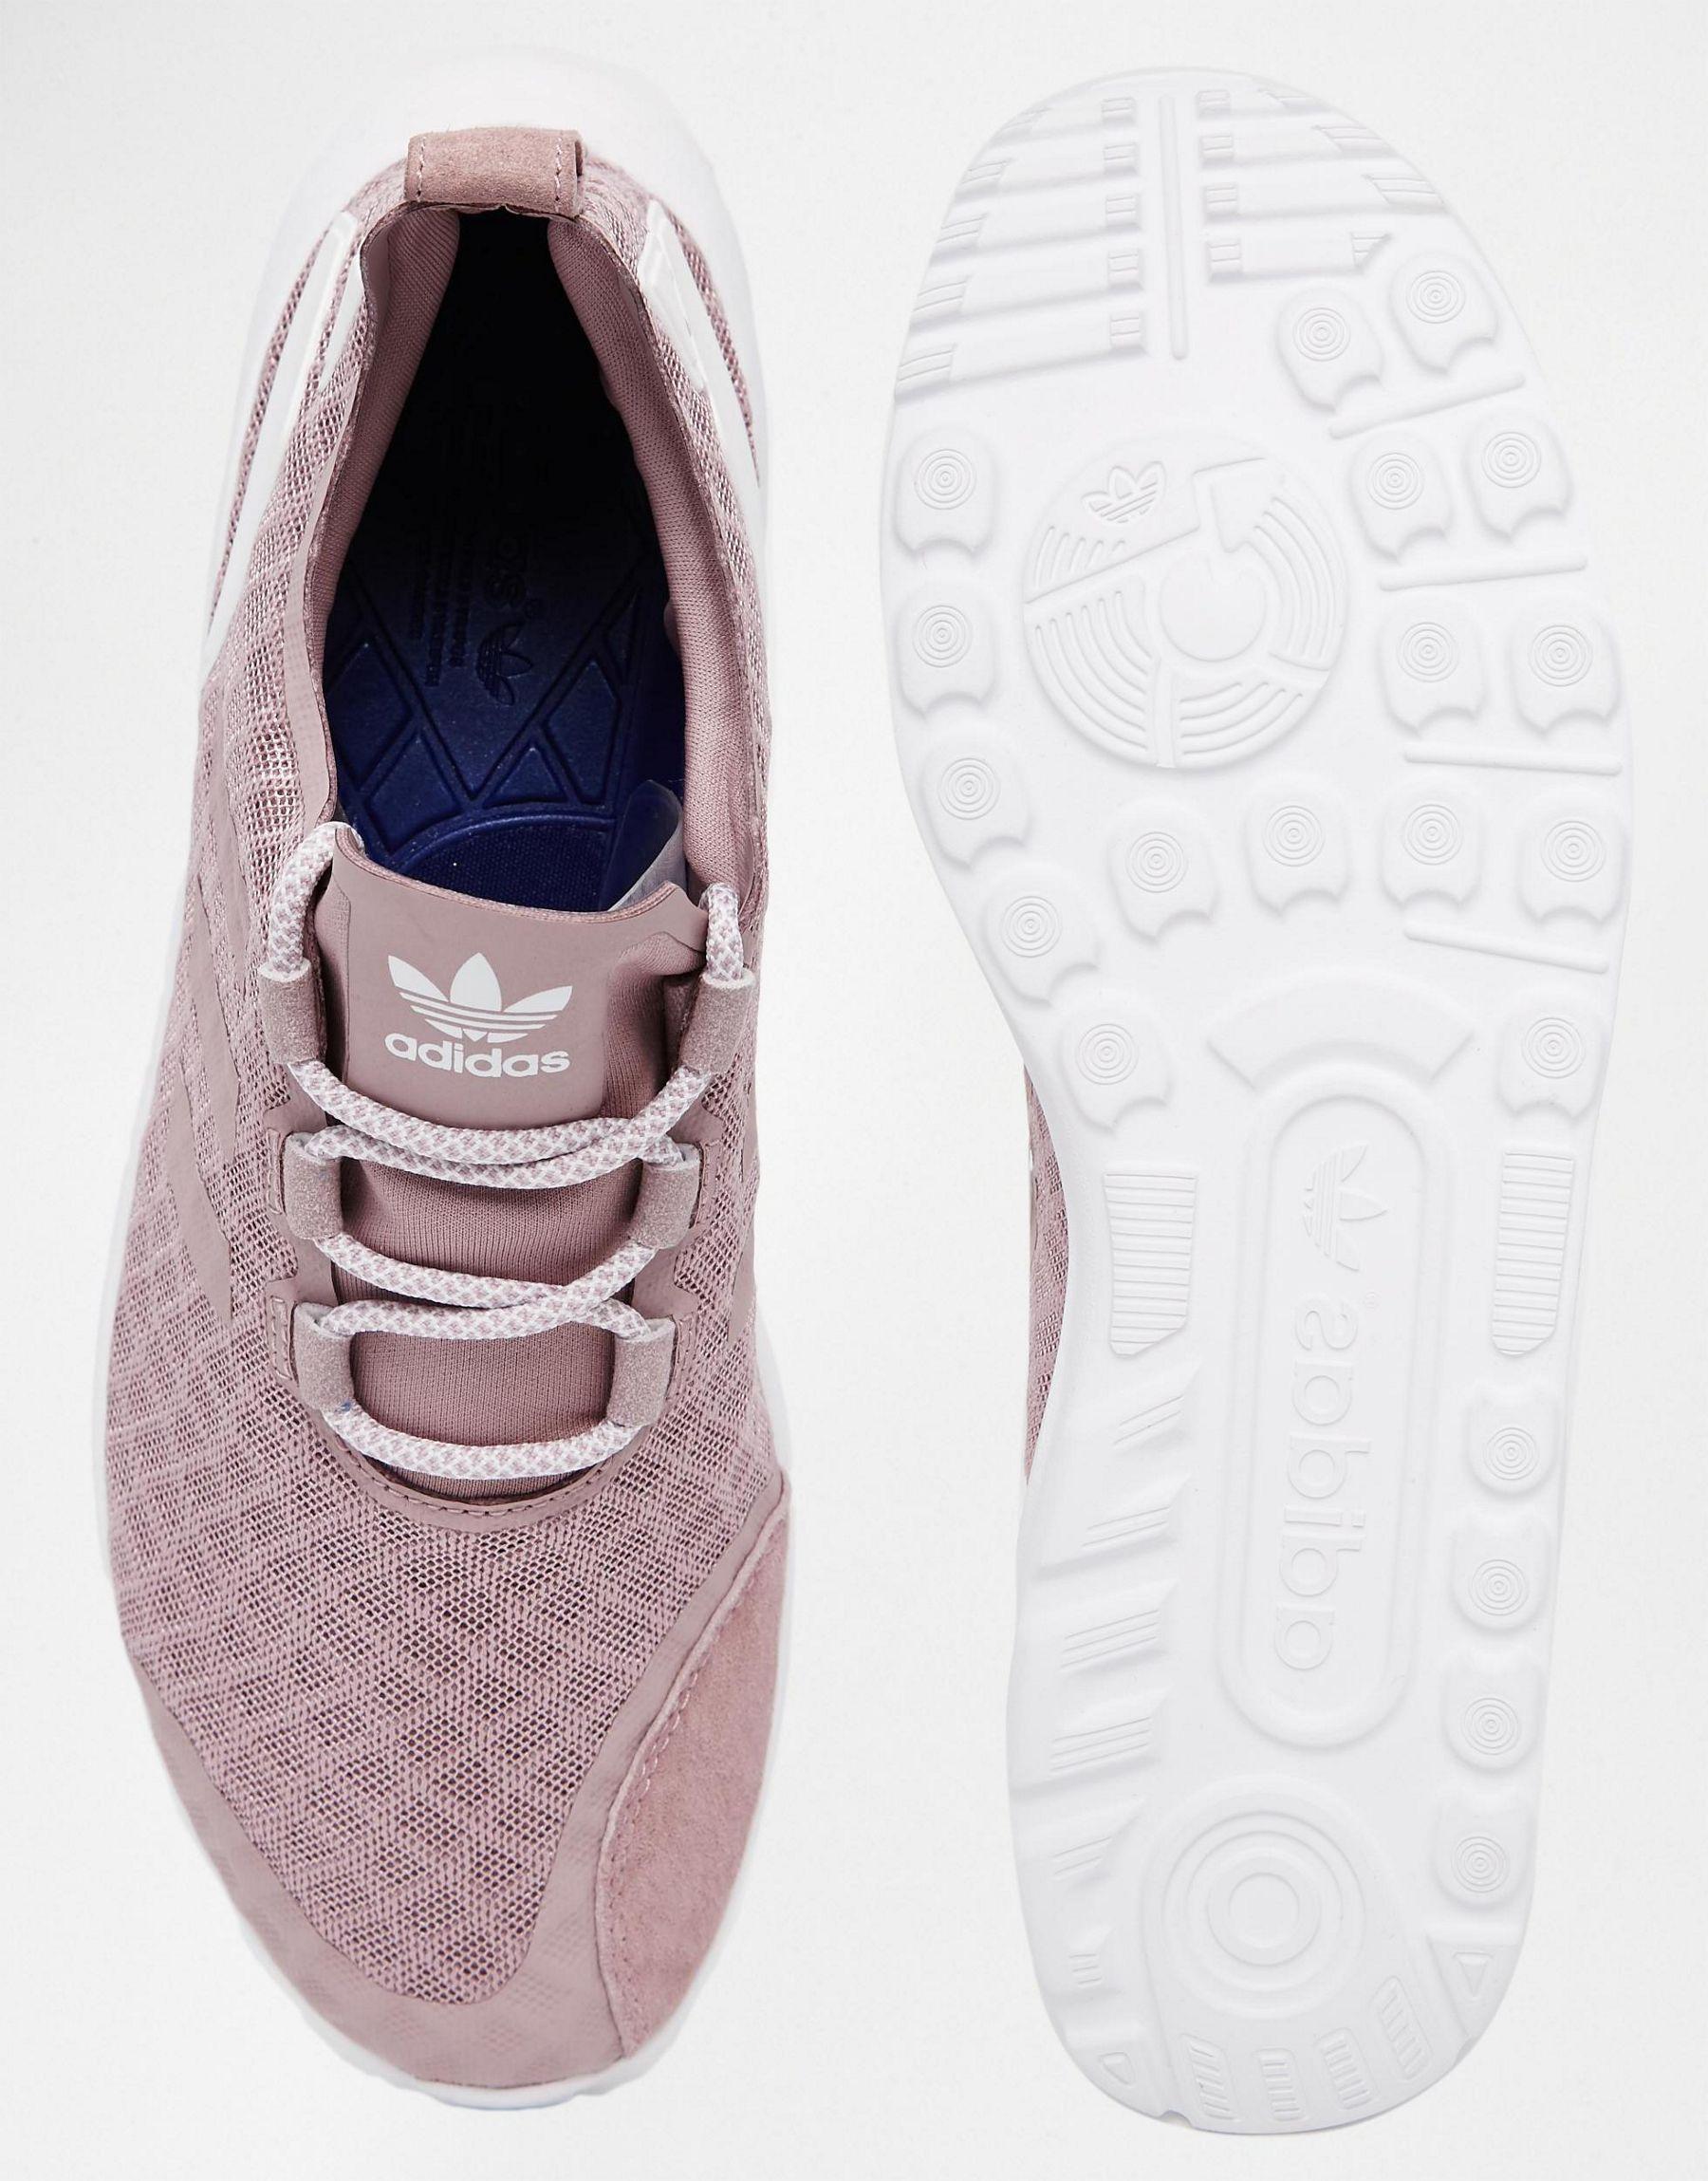 Lyst - adidas Originals Originals Purple Zx Flux Verve Mesh Trainers ... 1035e9b858